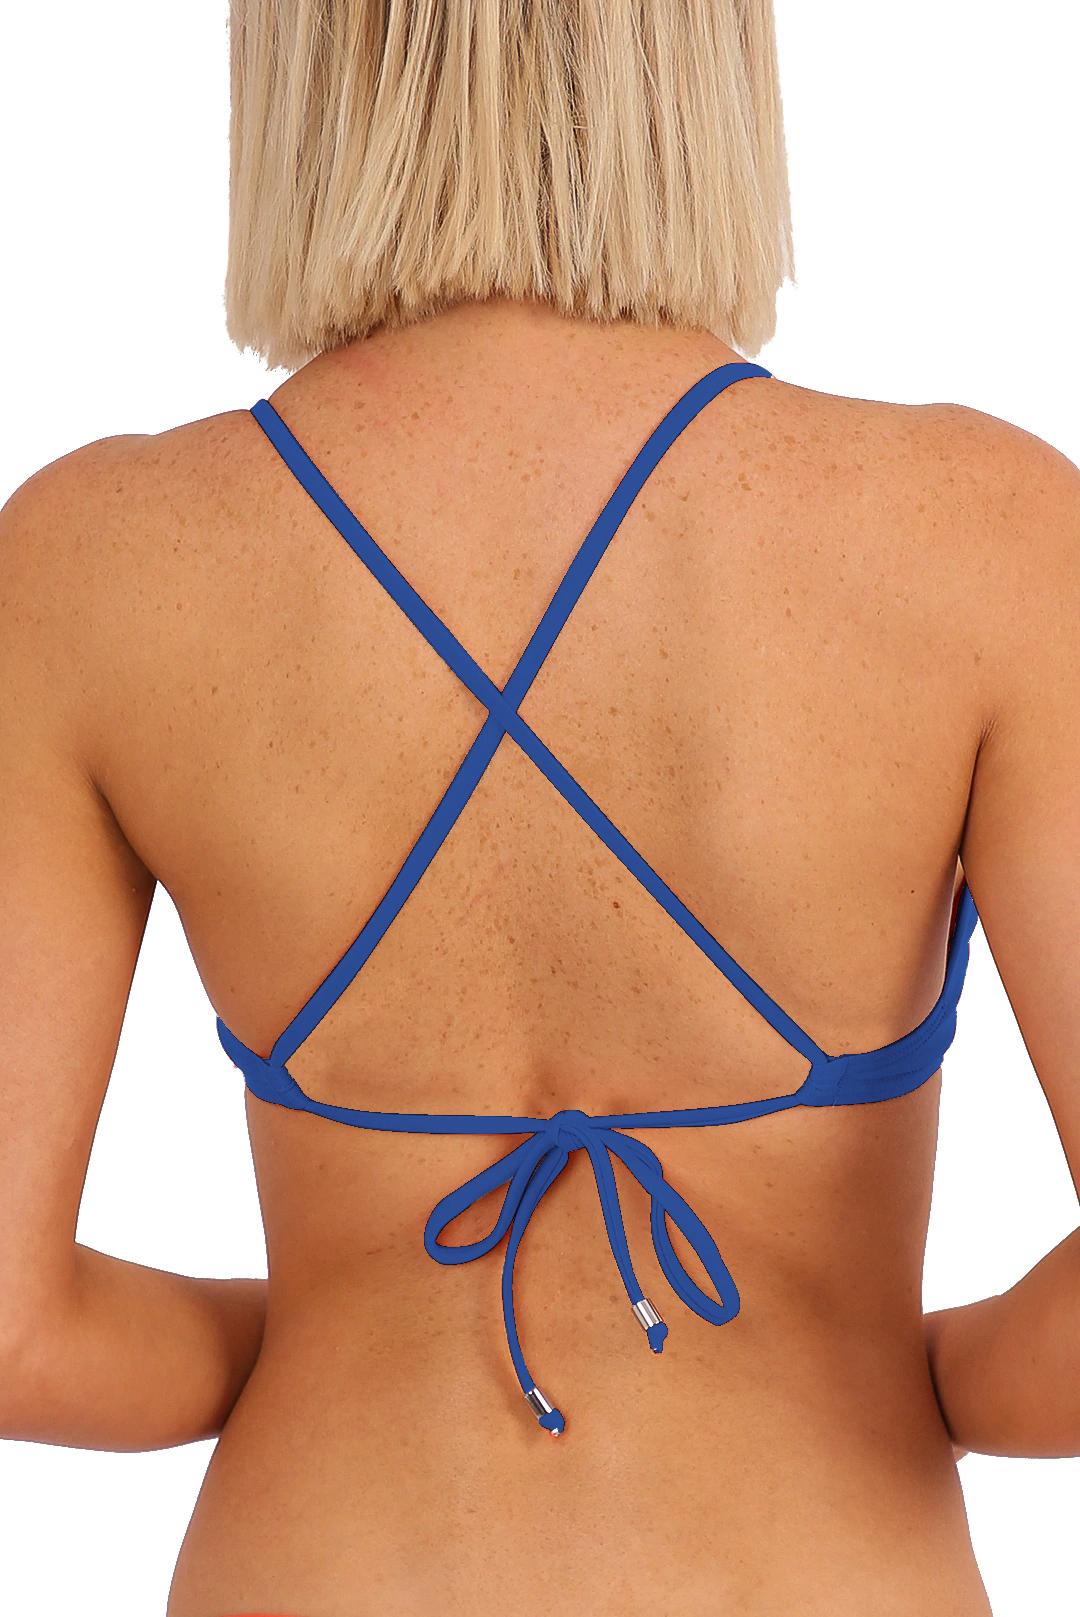 'Lola' Bralette Tie Back - Azure